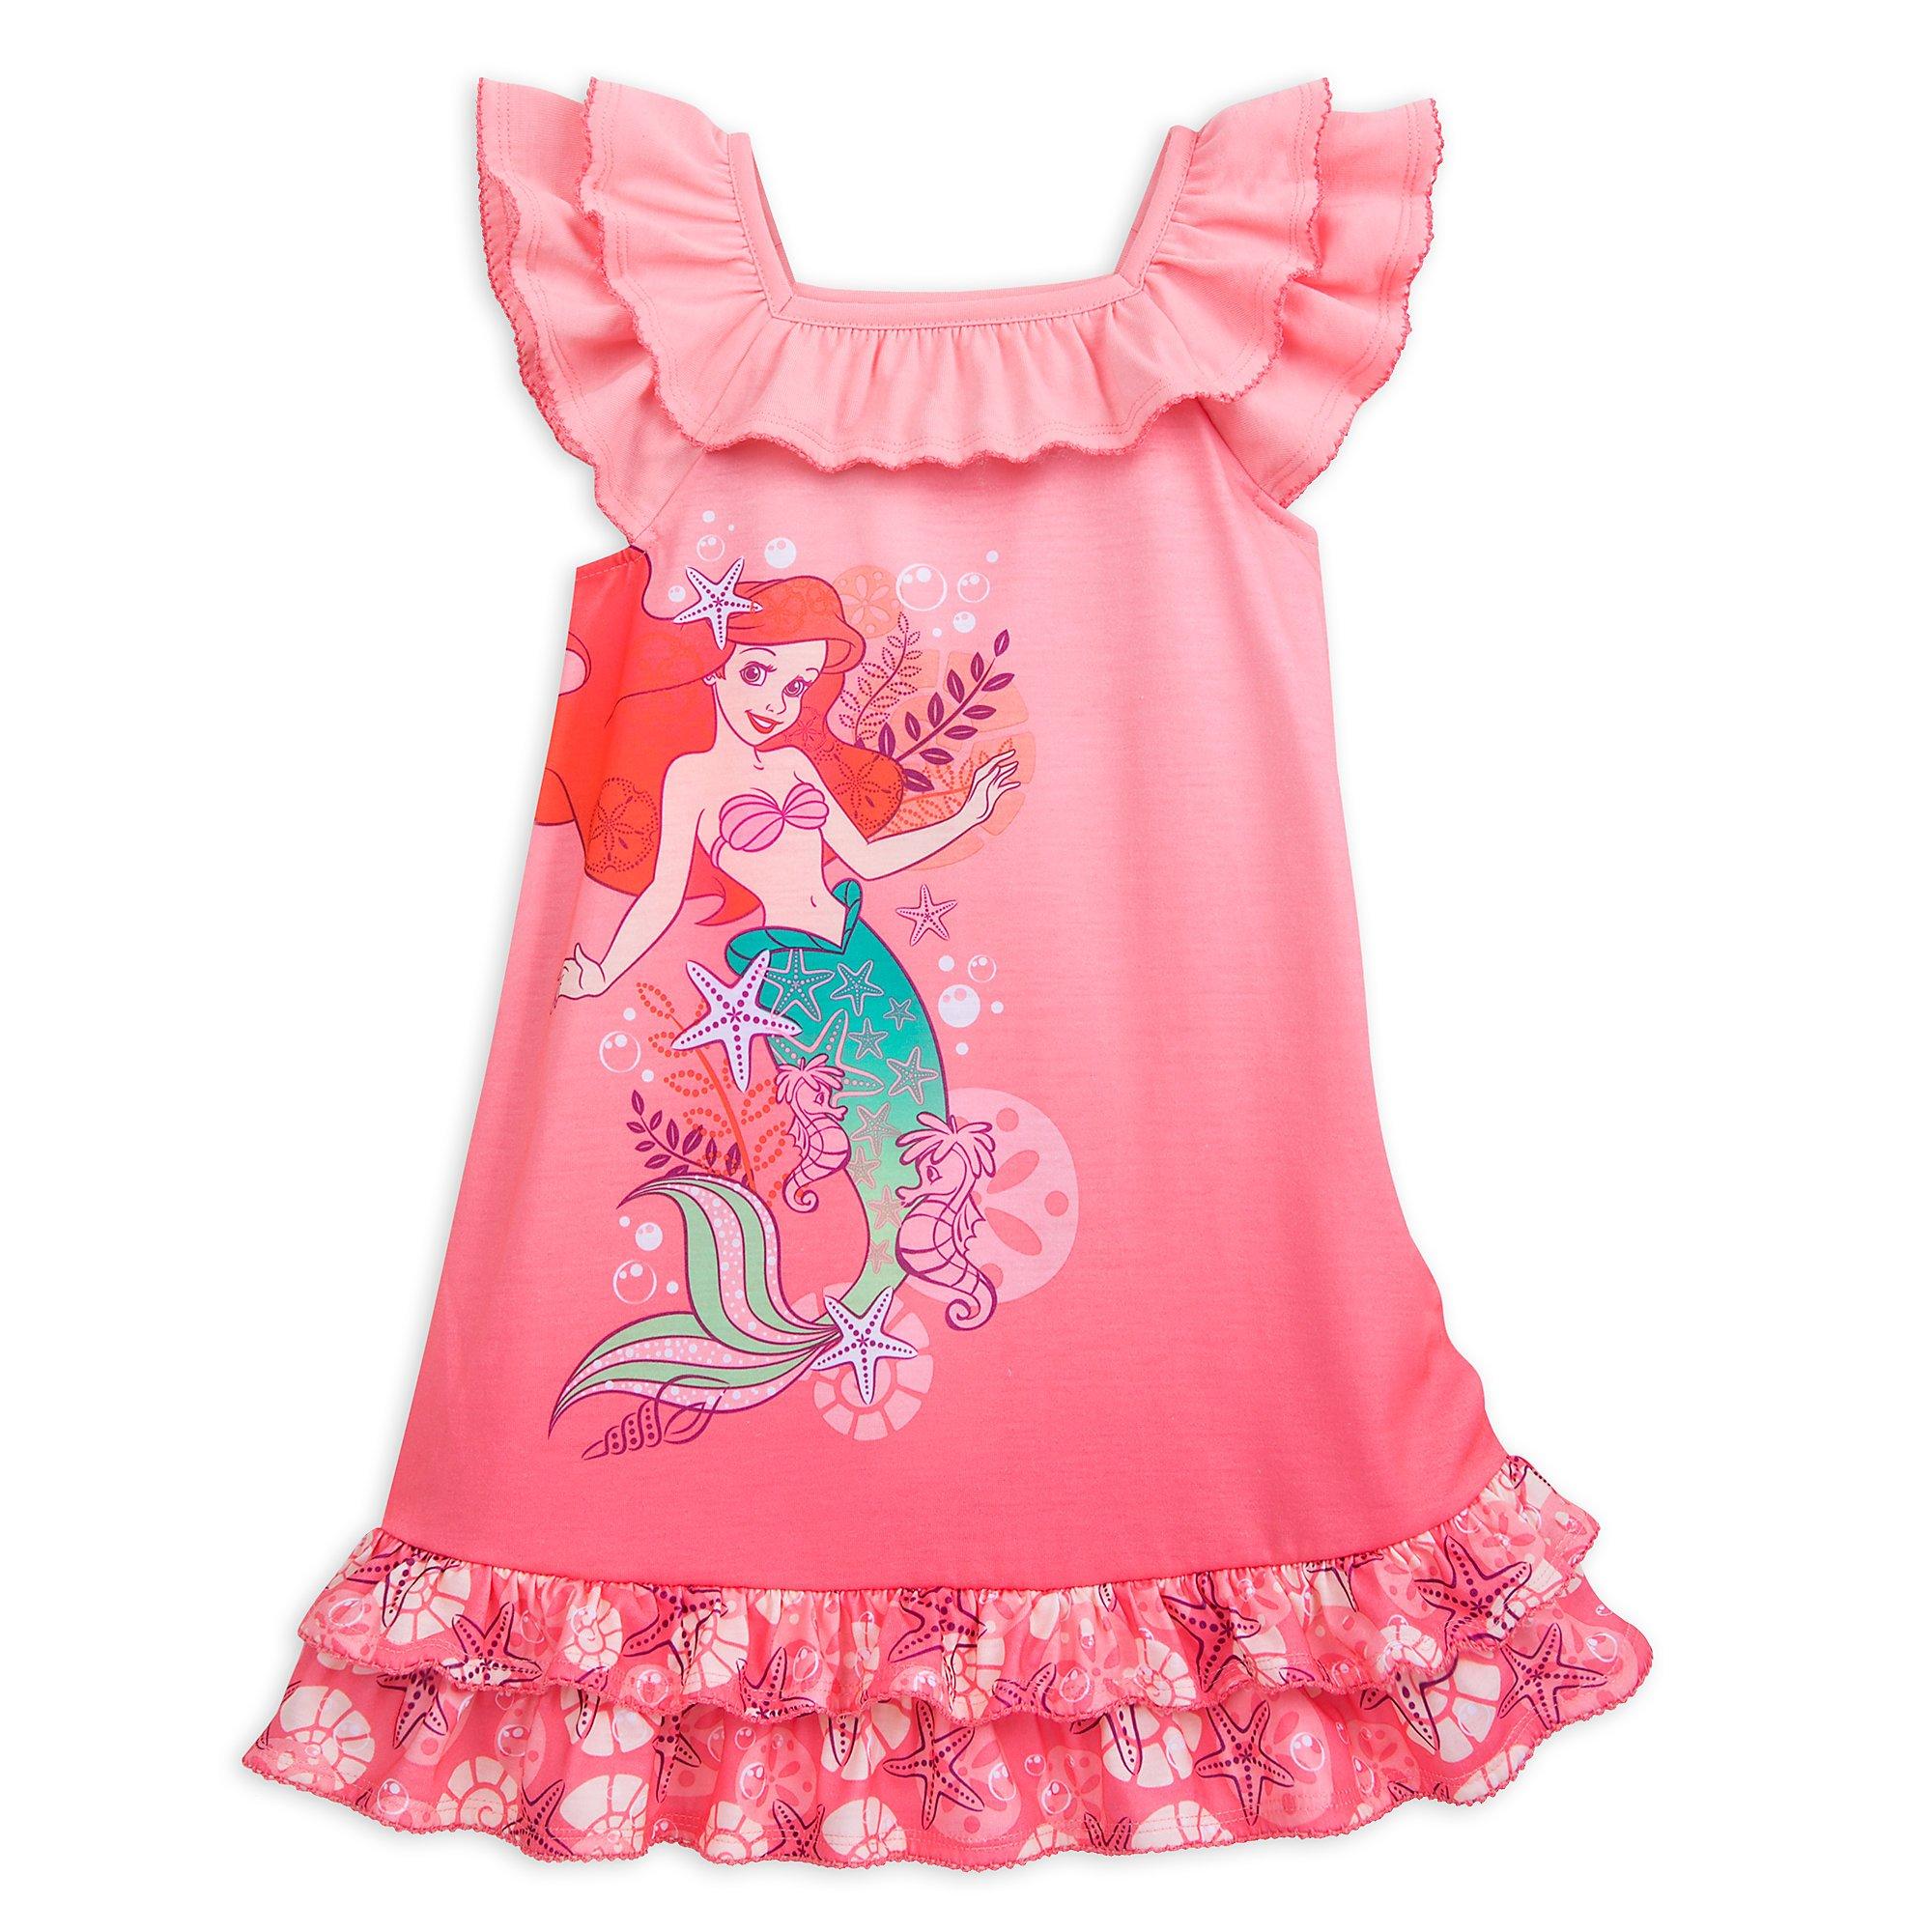 Disney Ariel Nightshirt for Girls Size 5/6 Multi by Disney (Image #1)